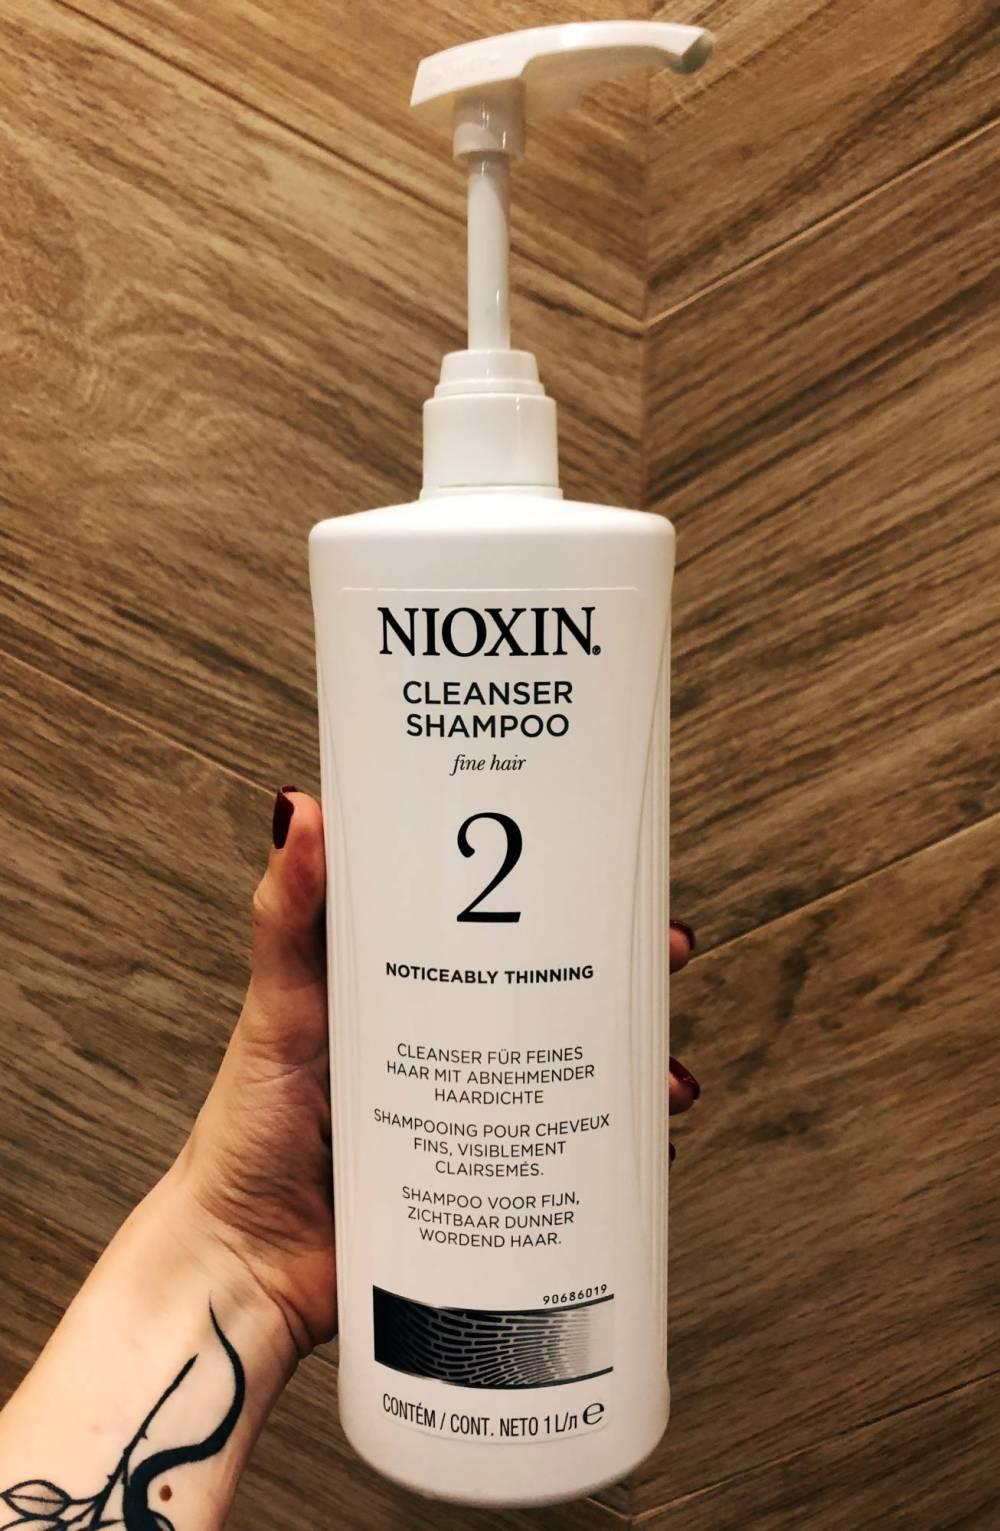 Nioxin Cleansing Shampoo 2 wesowow